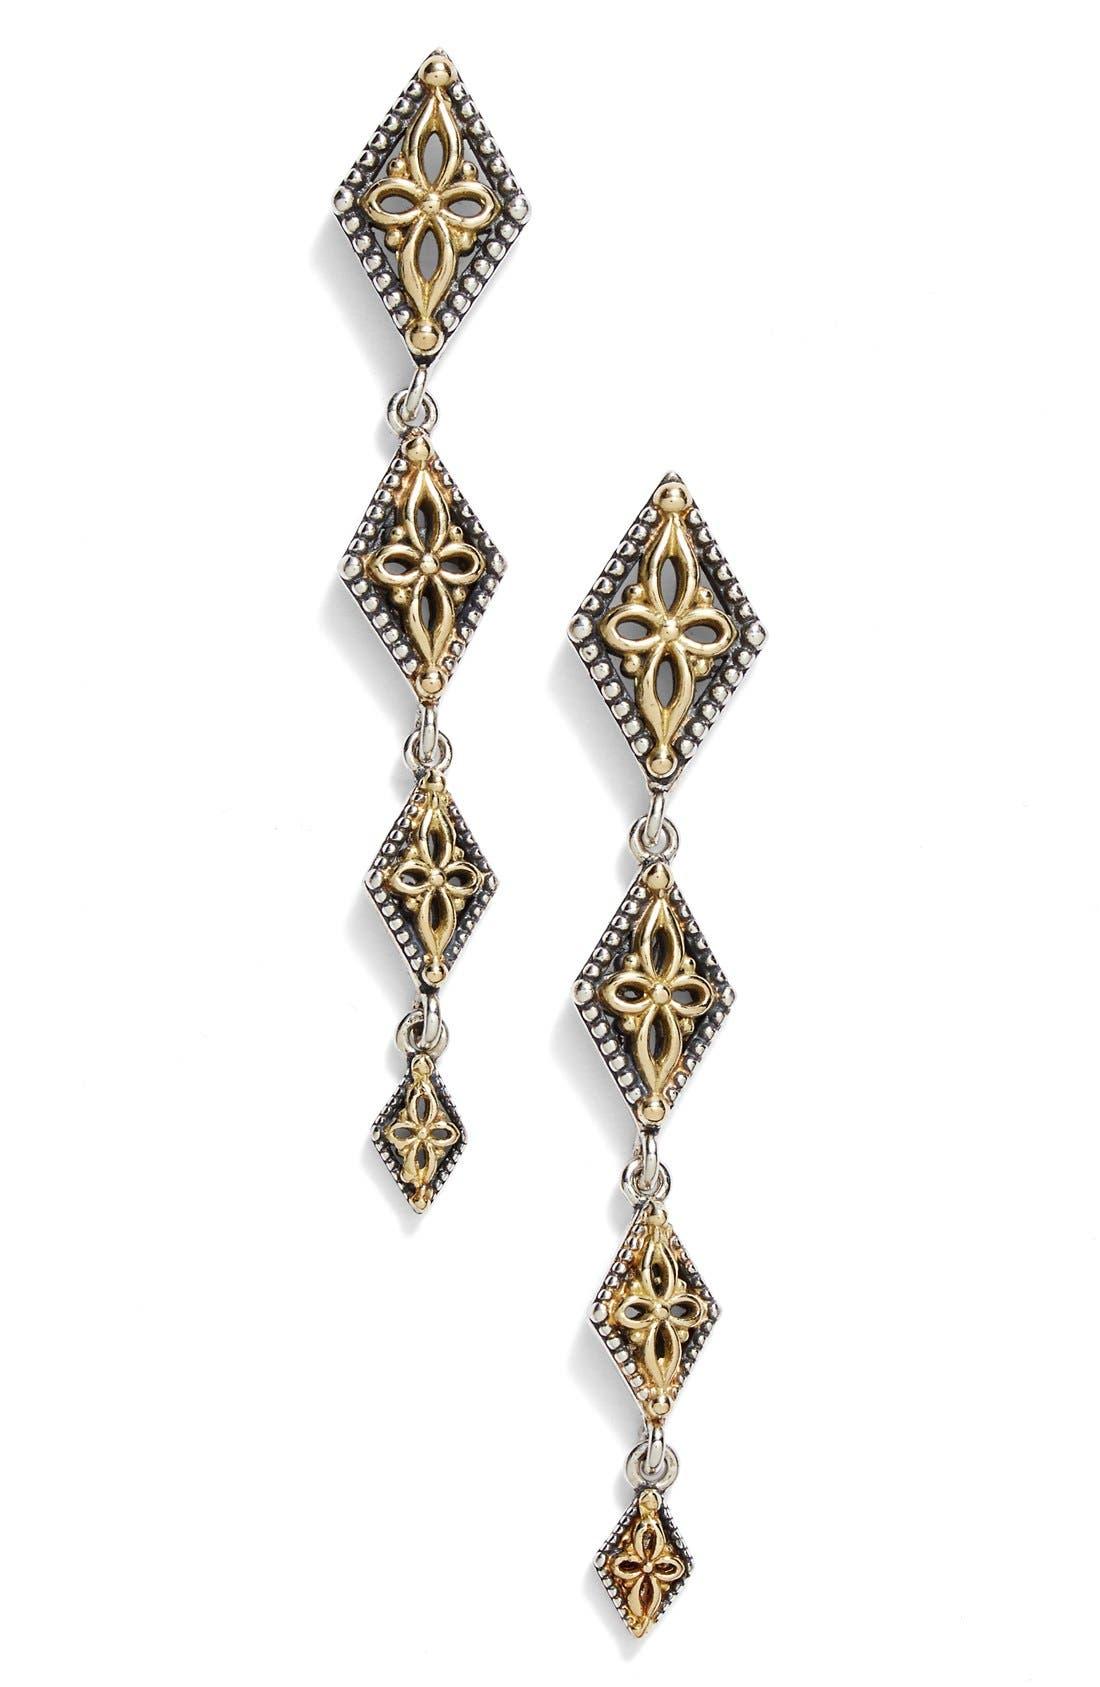 Main Image - Konstantino 'Hebe' Etched Drop Earrings